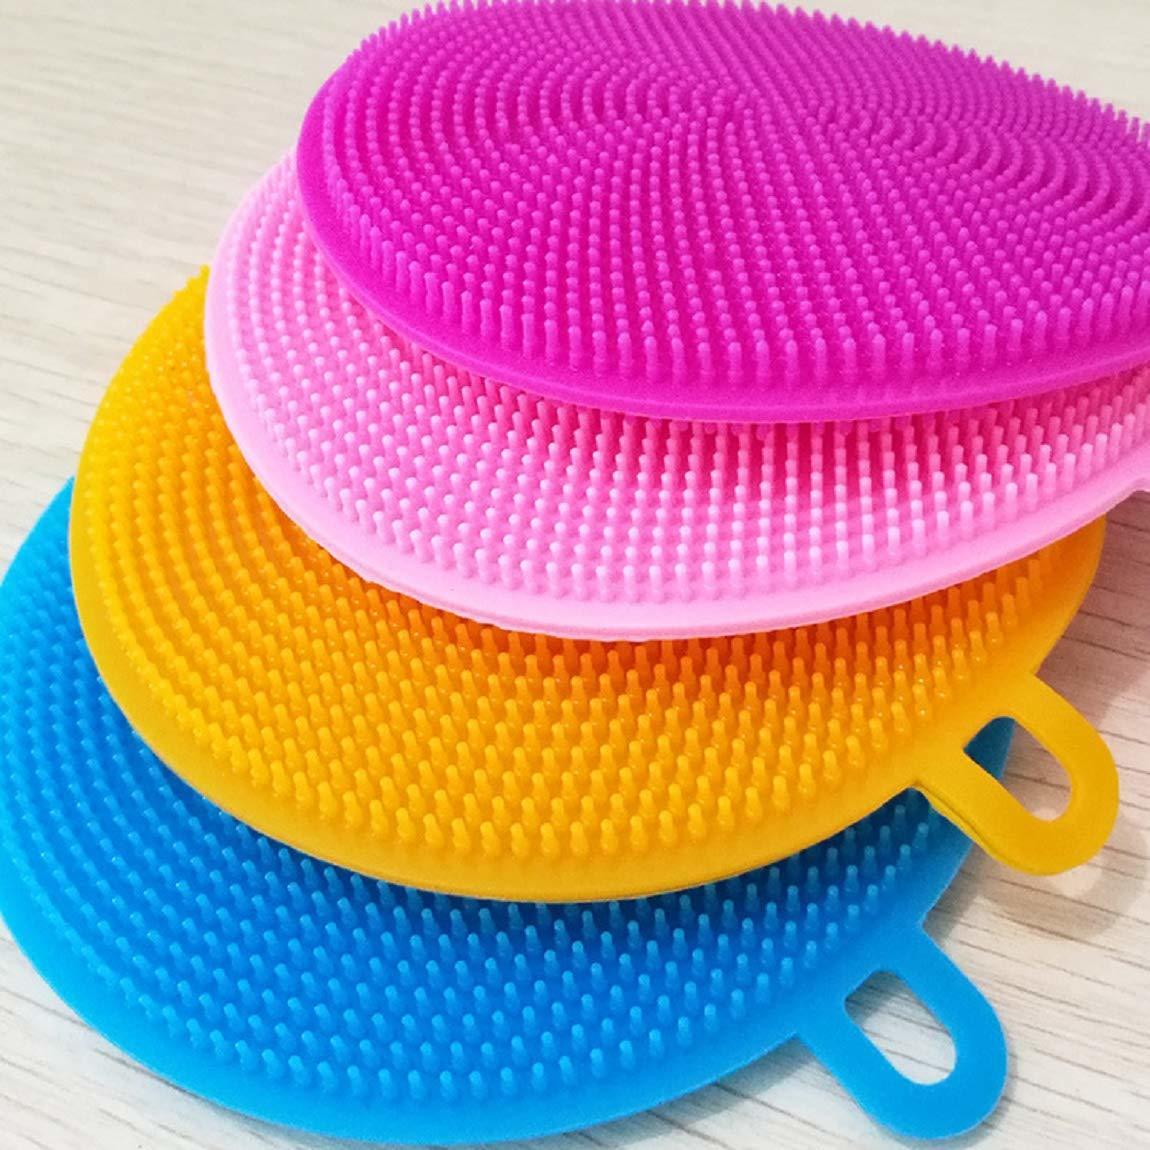 Silicone Washing Sponge Scrubber